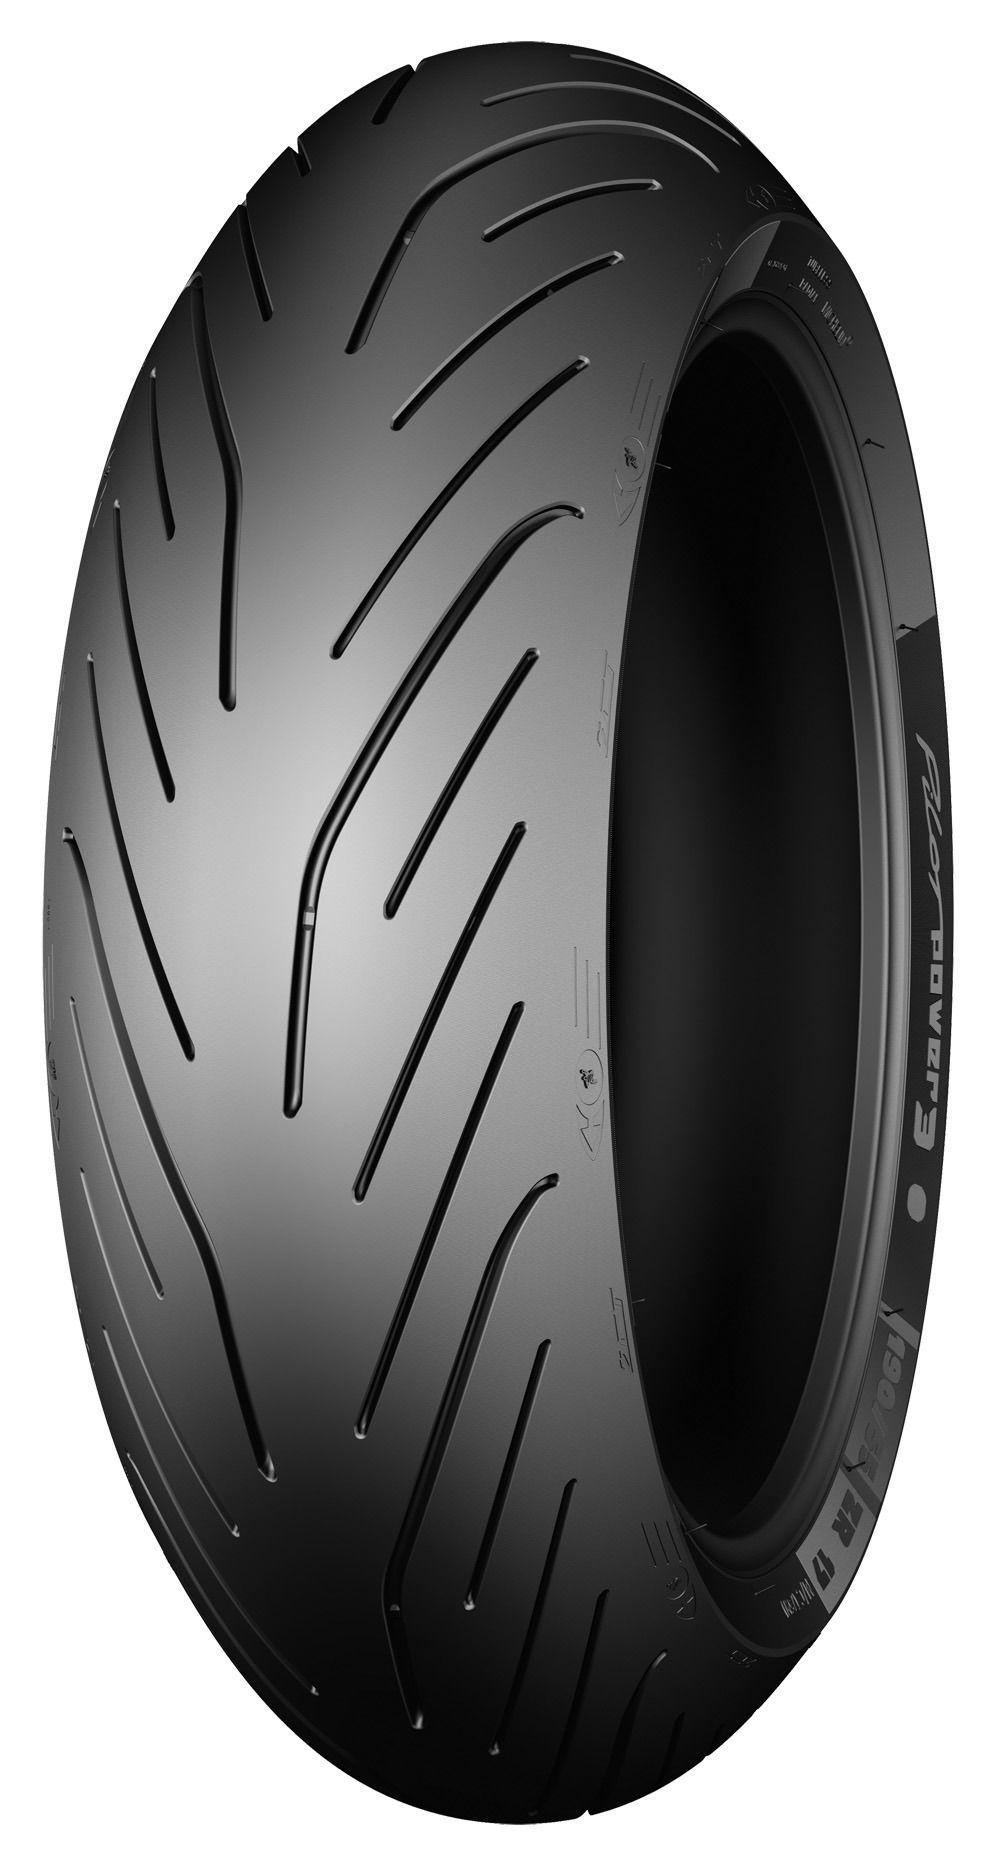 michelin pilot power 3 rear tires revzilla. Black Bedroom Furniture Sets. Home Design Ideas